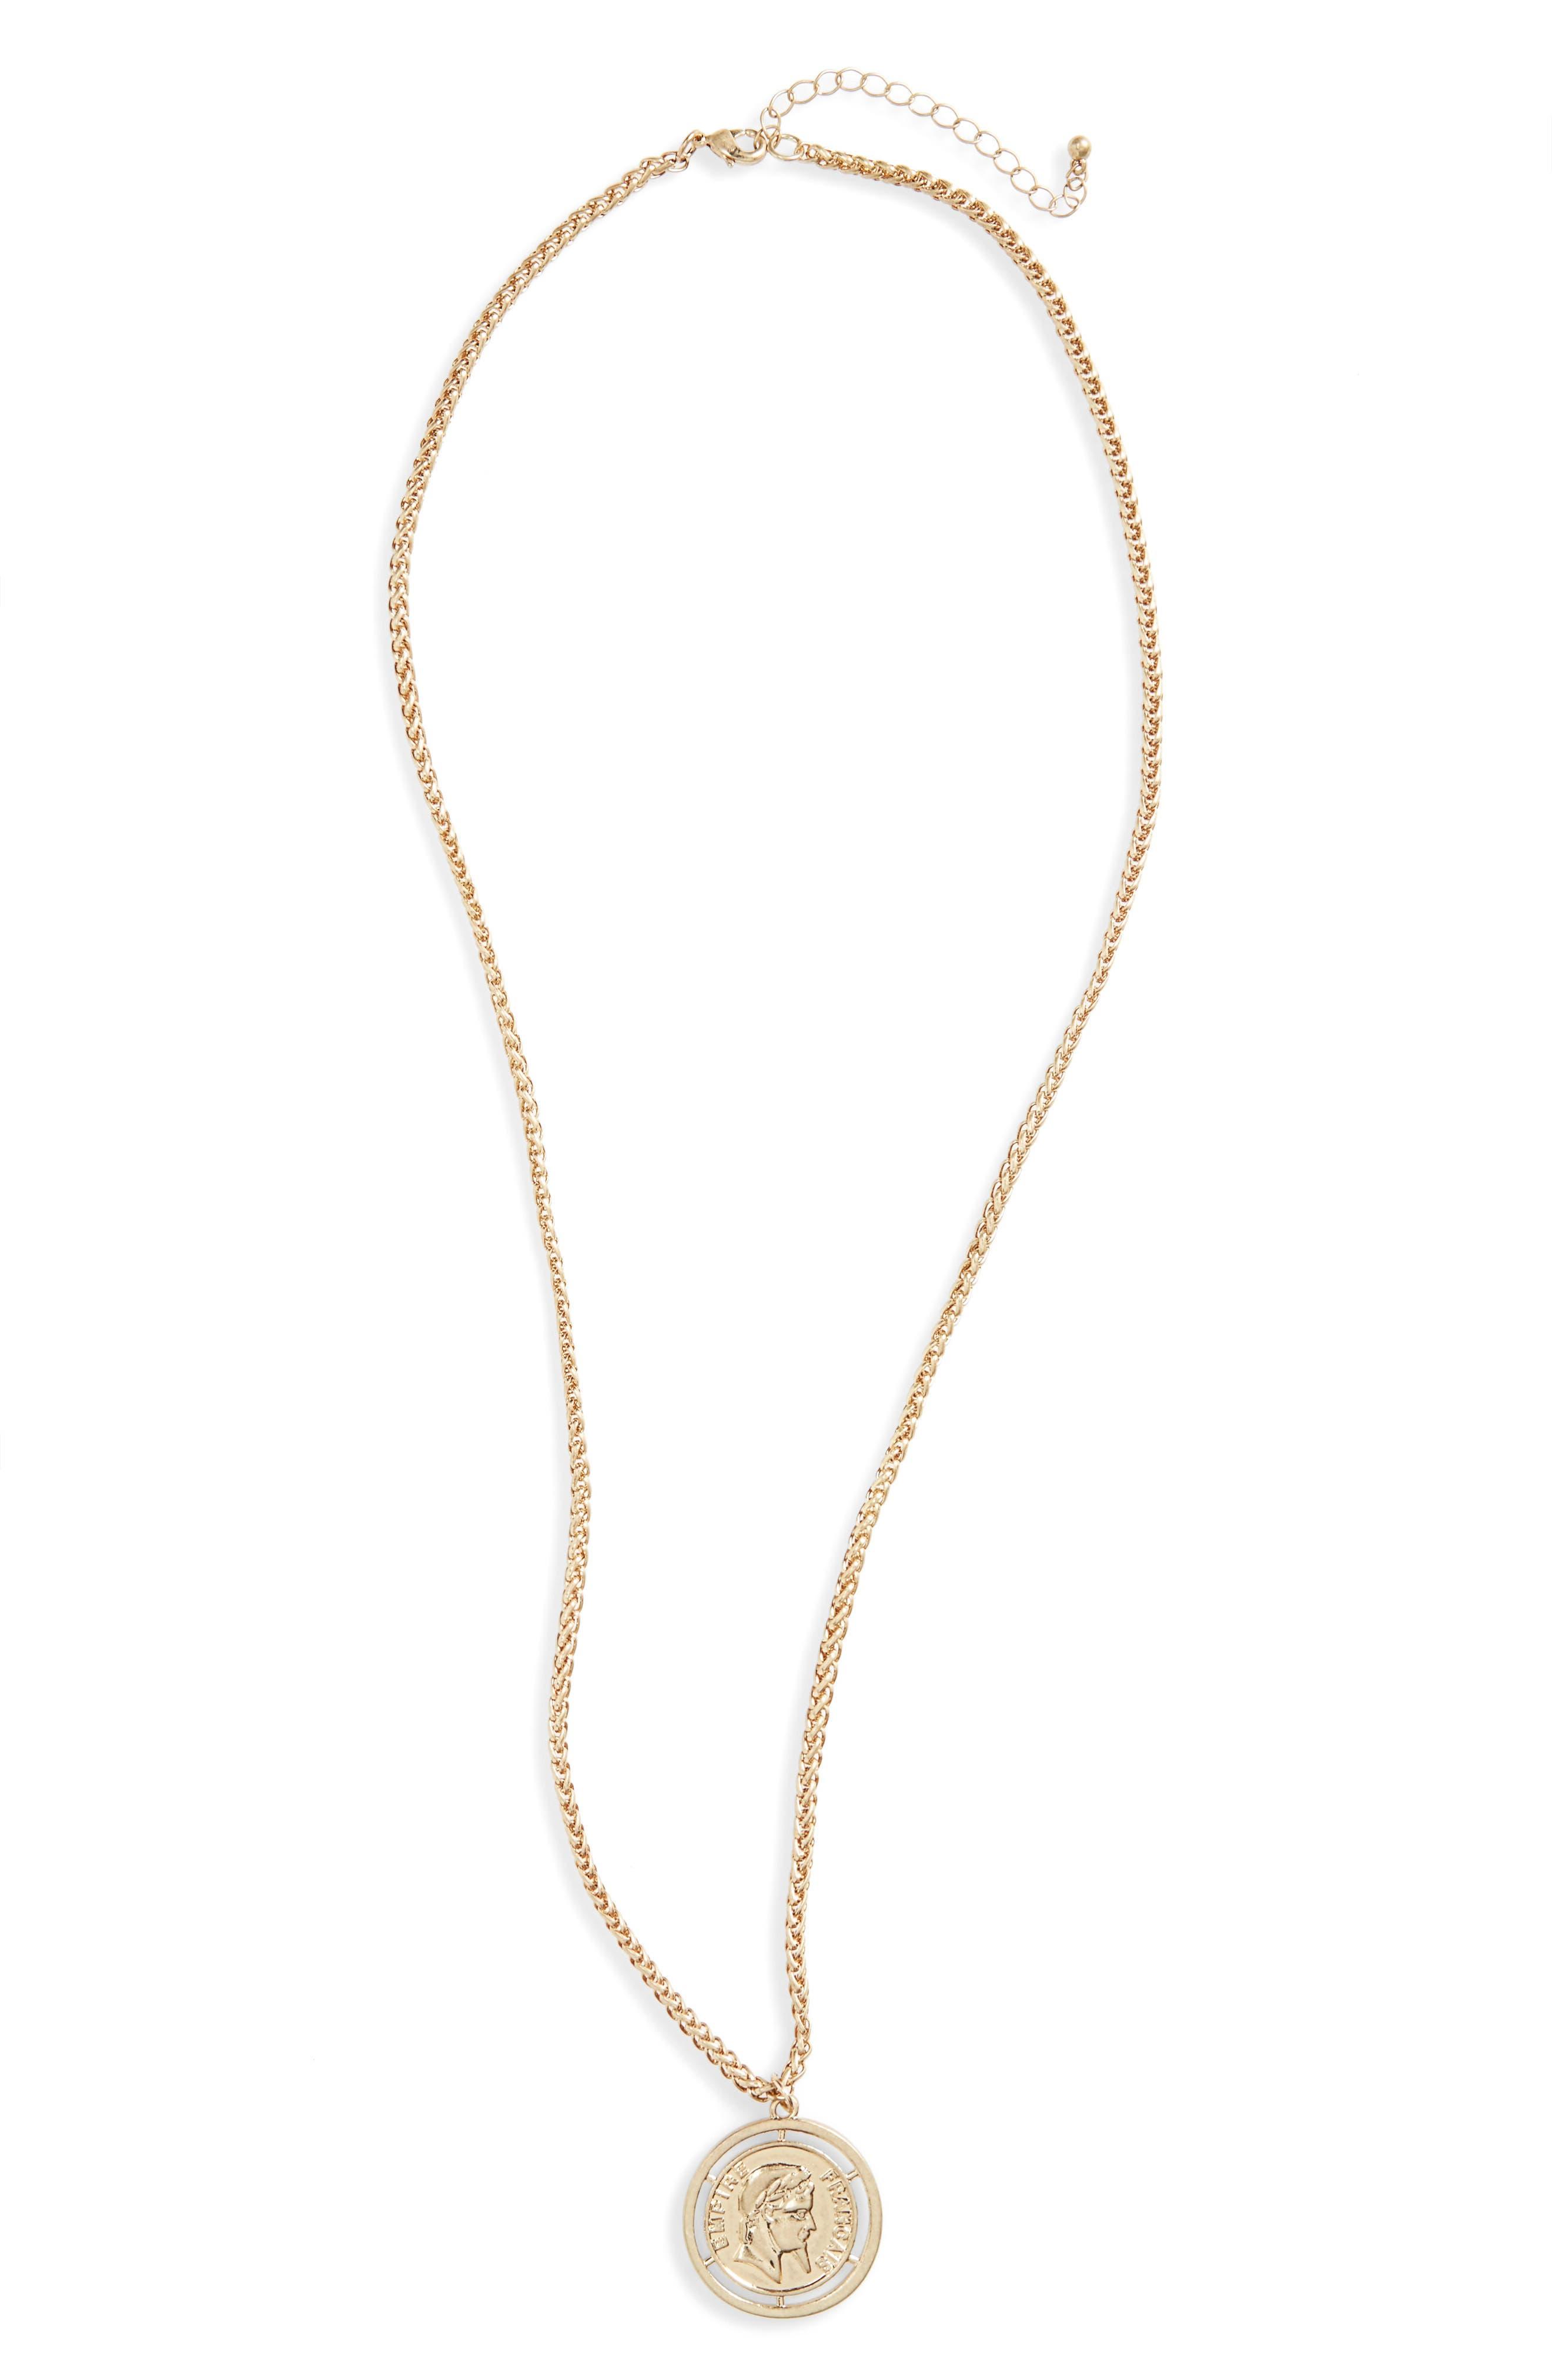 Coin Pendant Necklace,                             Main thumbnail 1, color,                             710